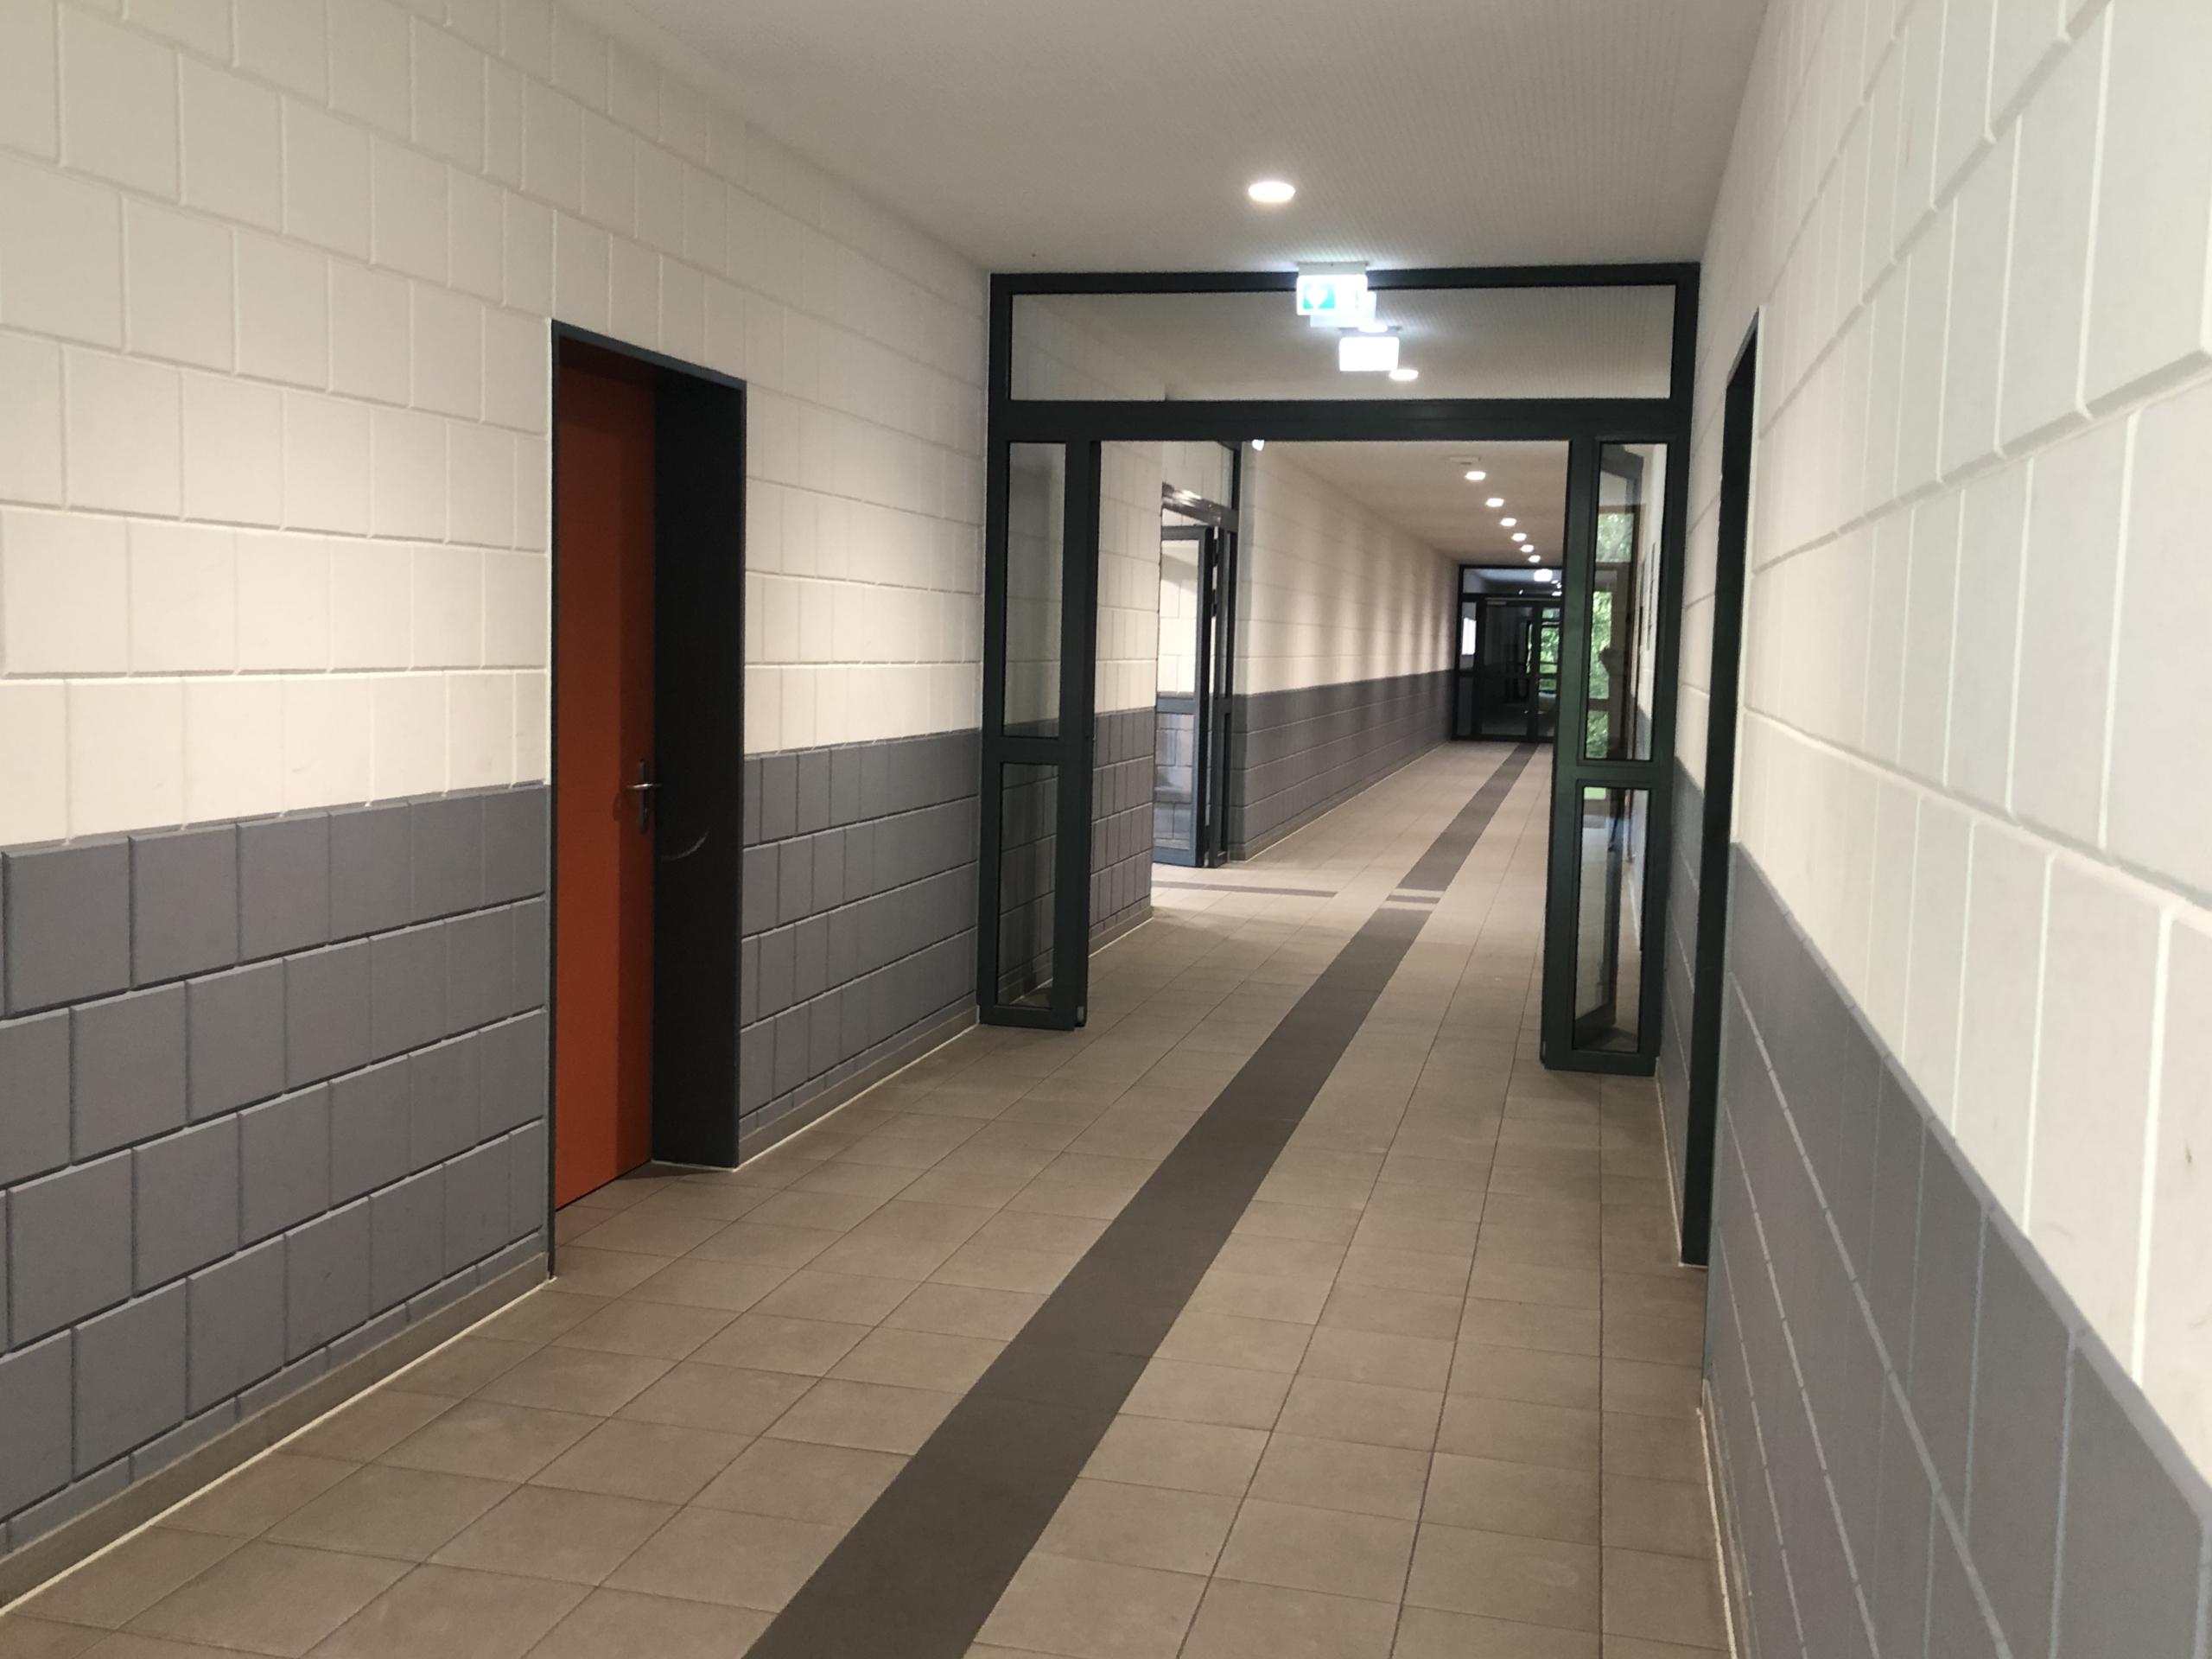 Kabinentrakt Burgwall-Stadion